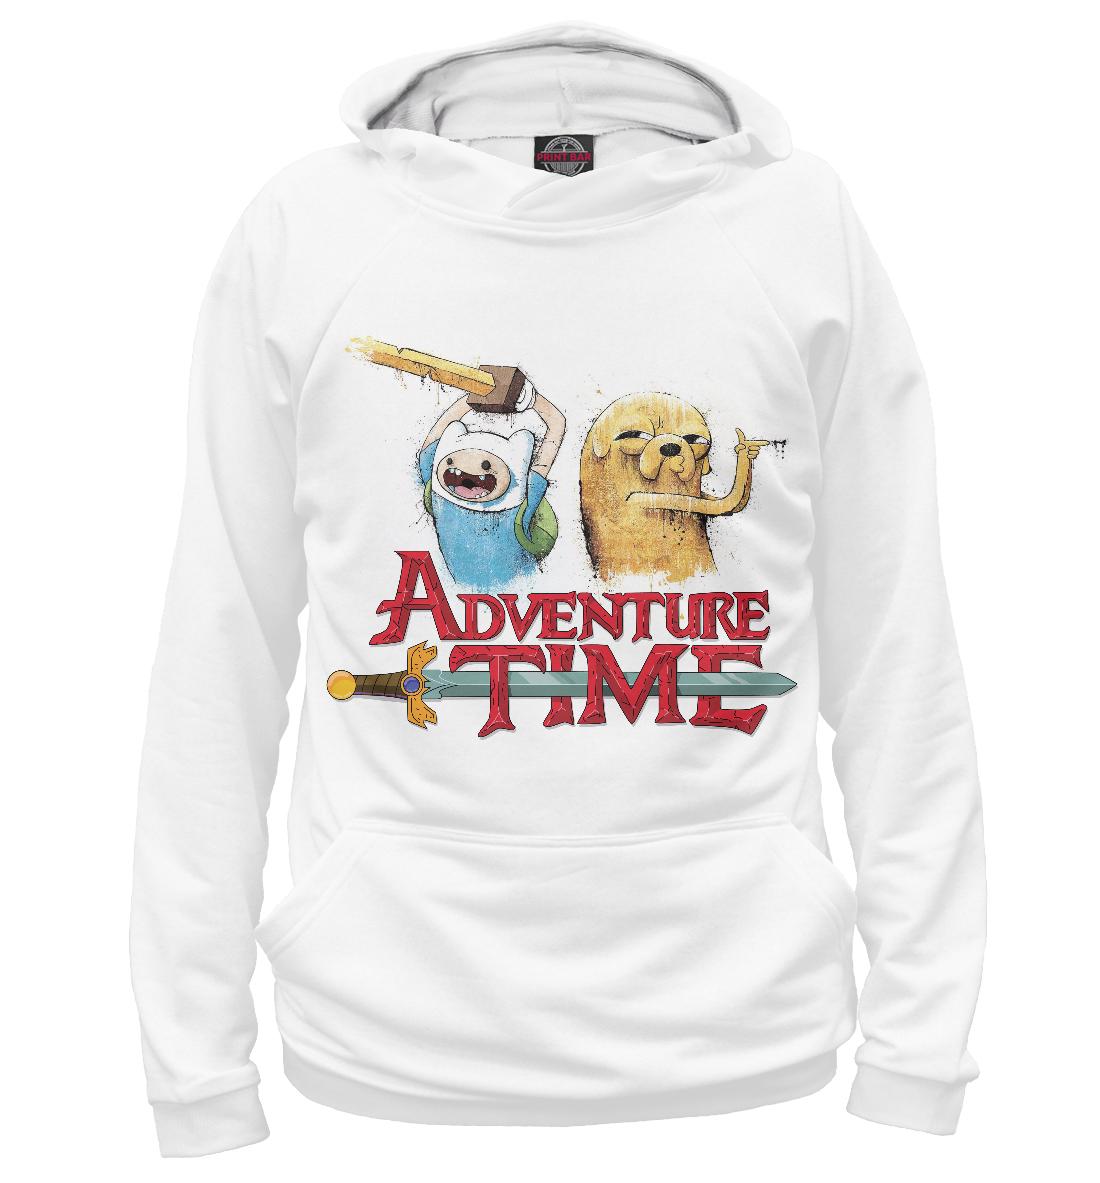 Купить Adventure Time Finn and Jake, Printbar, Худи, ADV-109309-hud-2